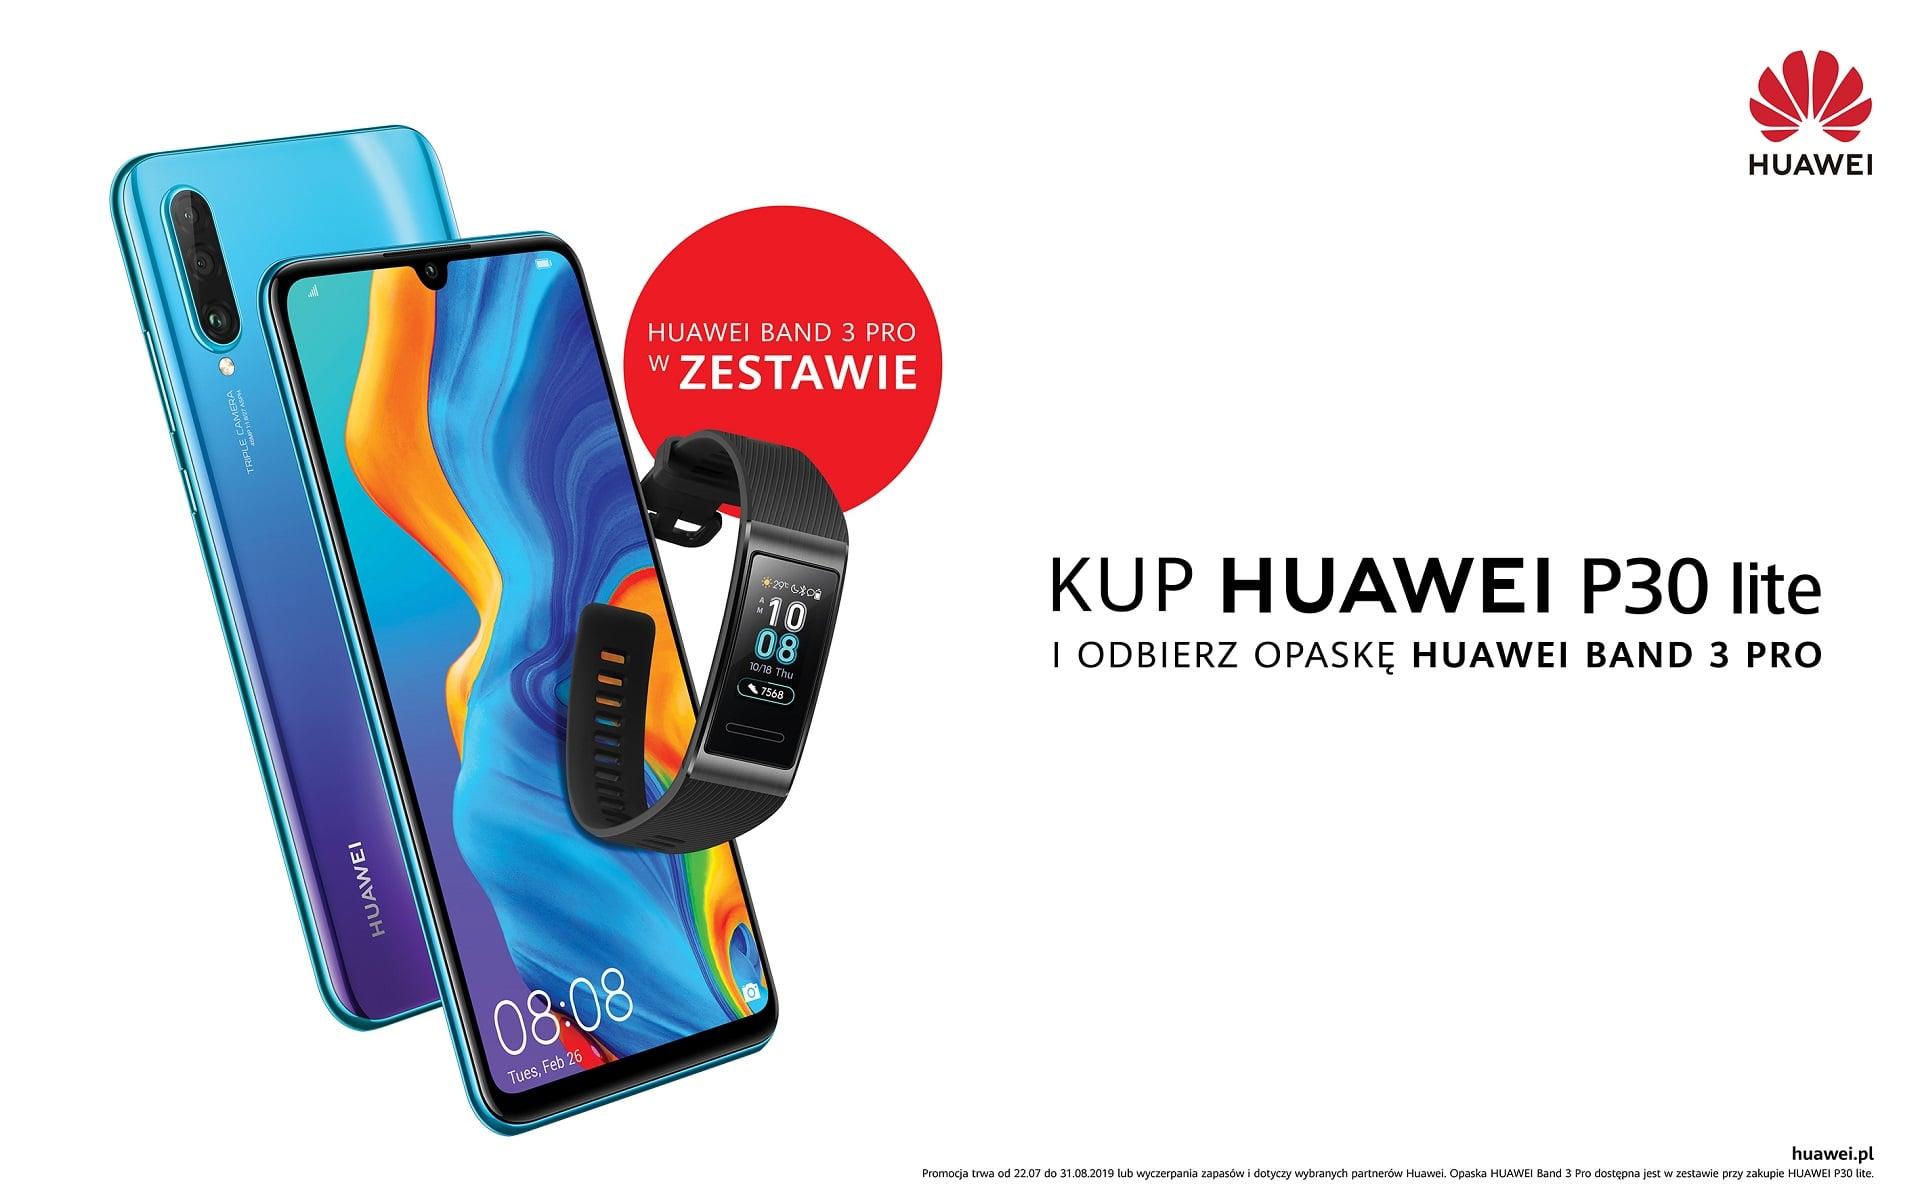 Promocja: kup Huawei P30 Lite, a opaskę Band 3 Pro dostaniesz gratis